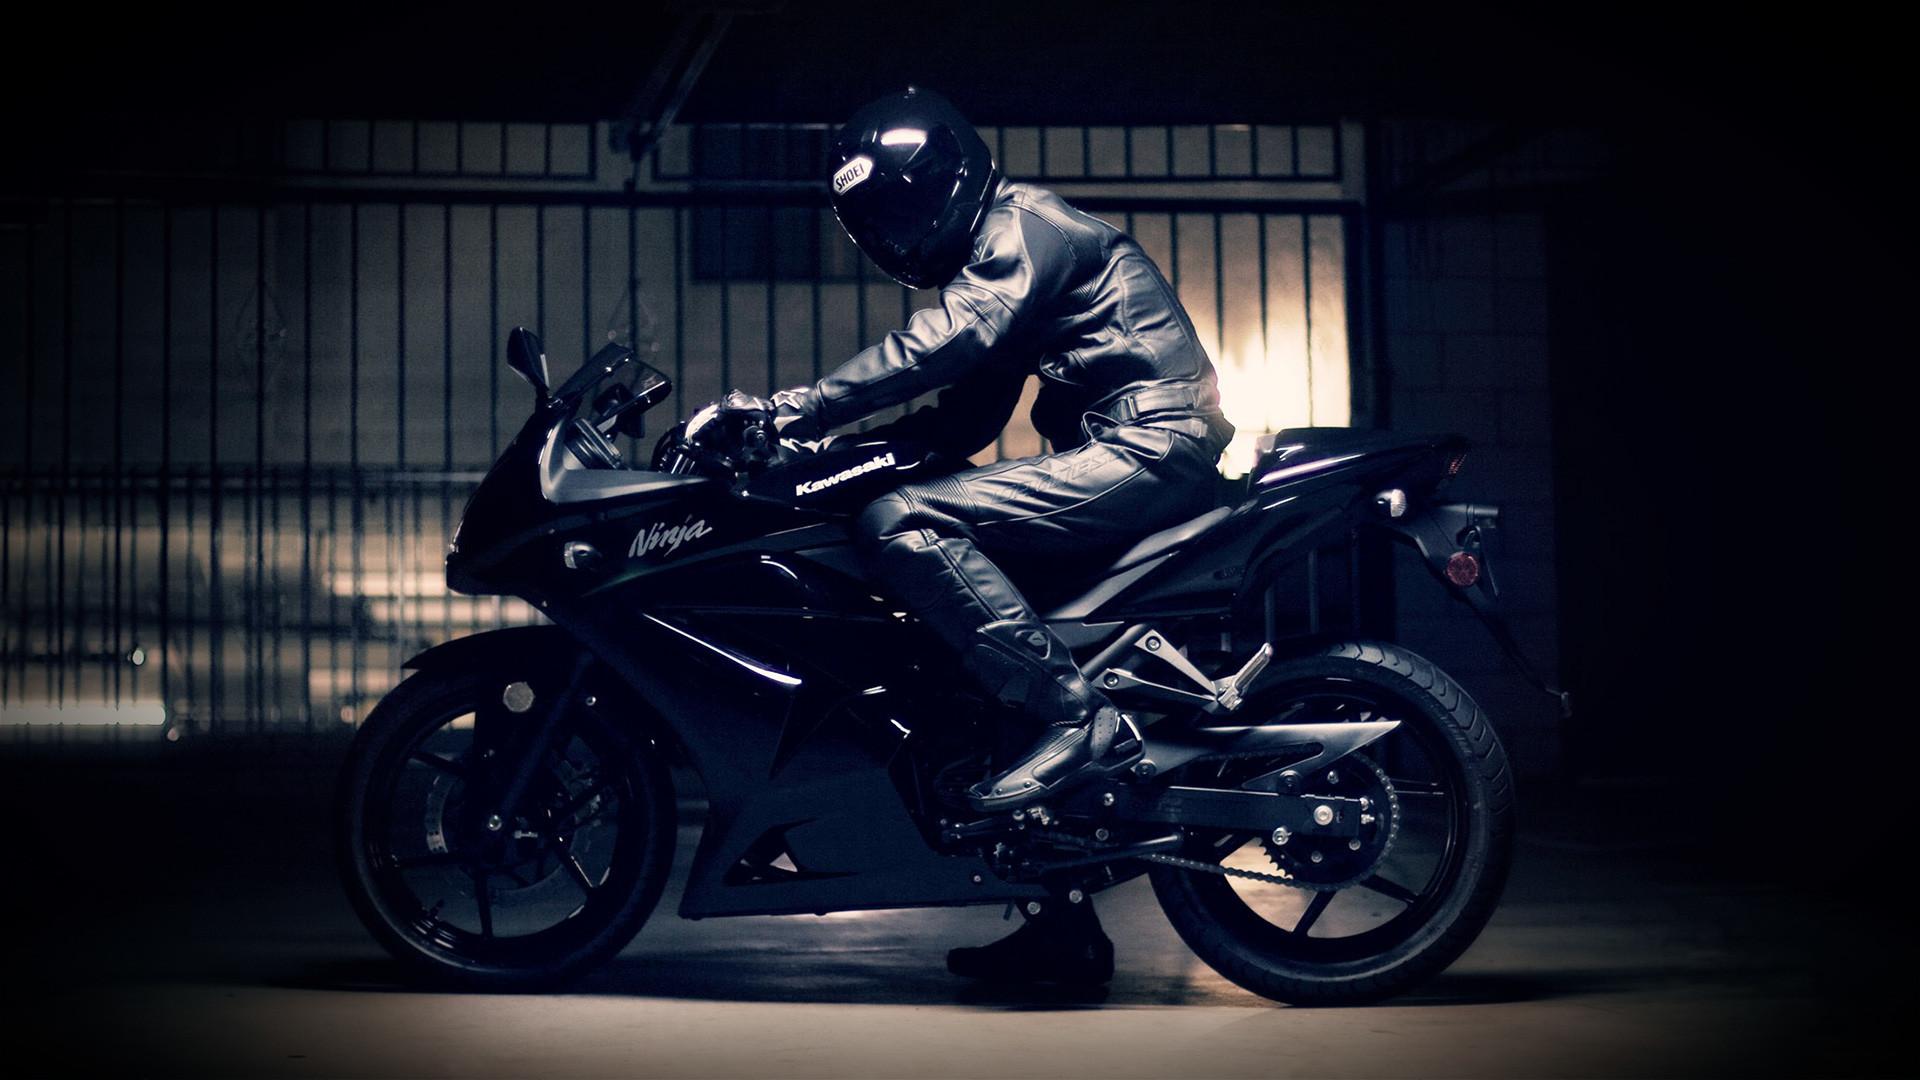 Картинки мотоциклистов на рабочий стол